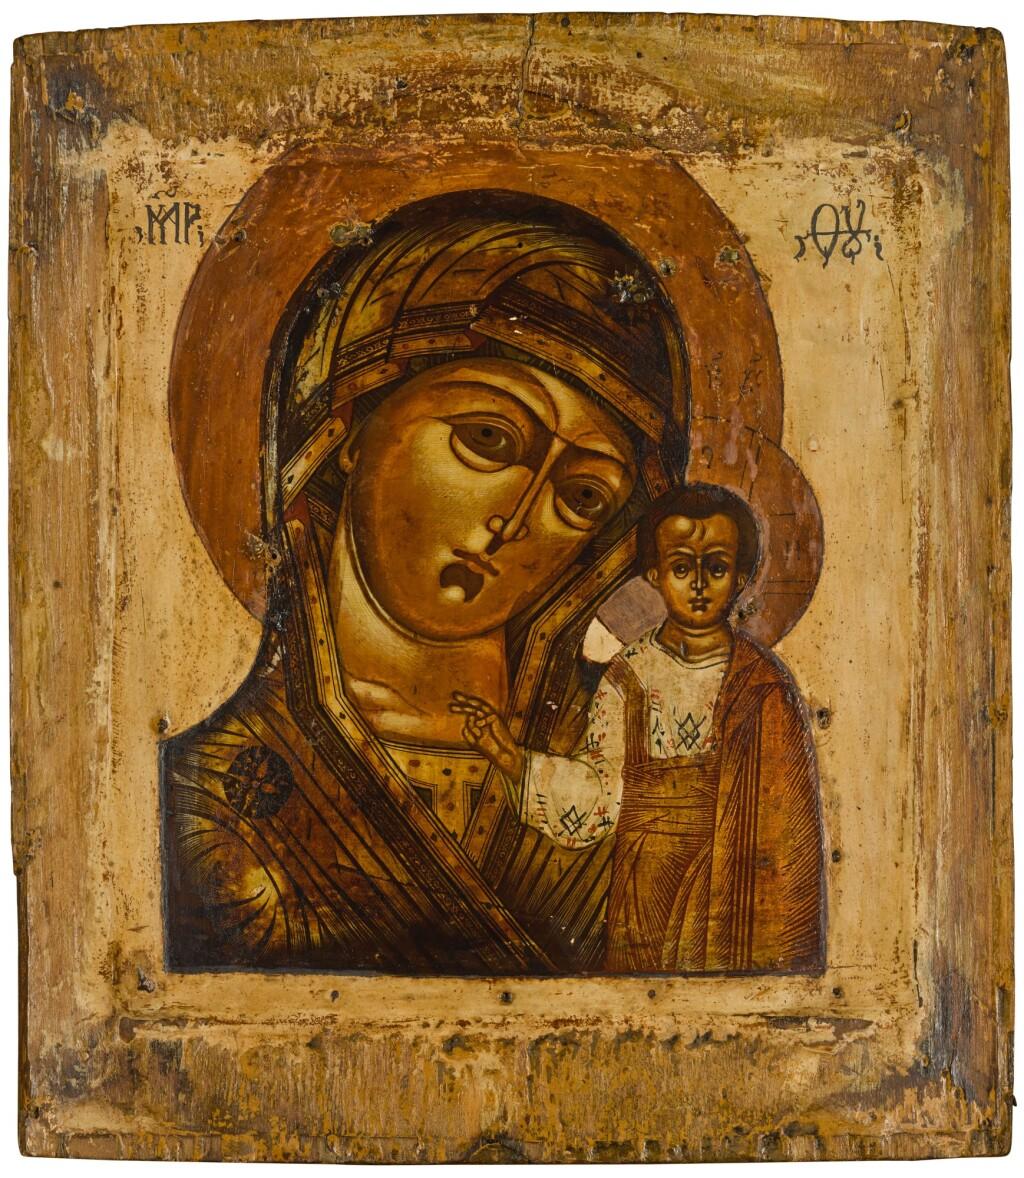 AN ICON OF THE KAZANSKAYA MOTHER OF GOD, RUSSIAN, 19TH CENTURY